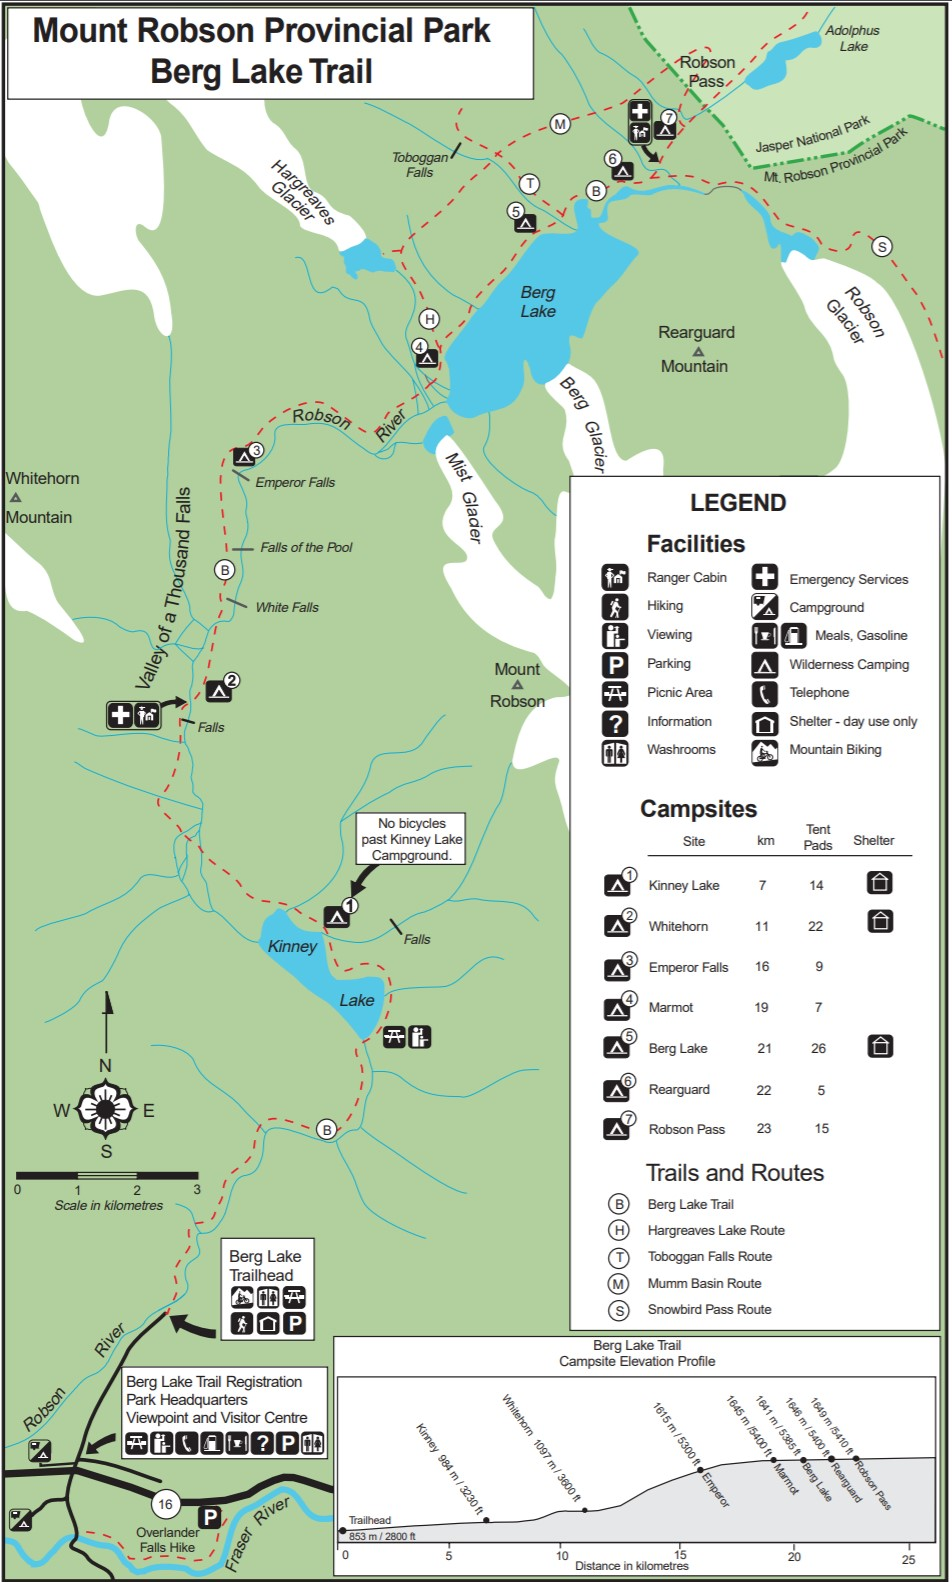 Mt. Robson Berg Lake Trail